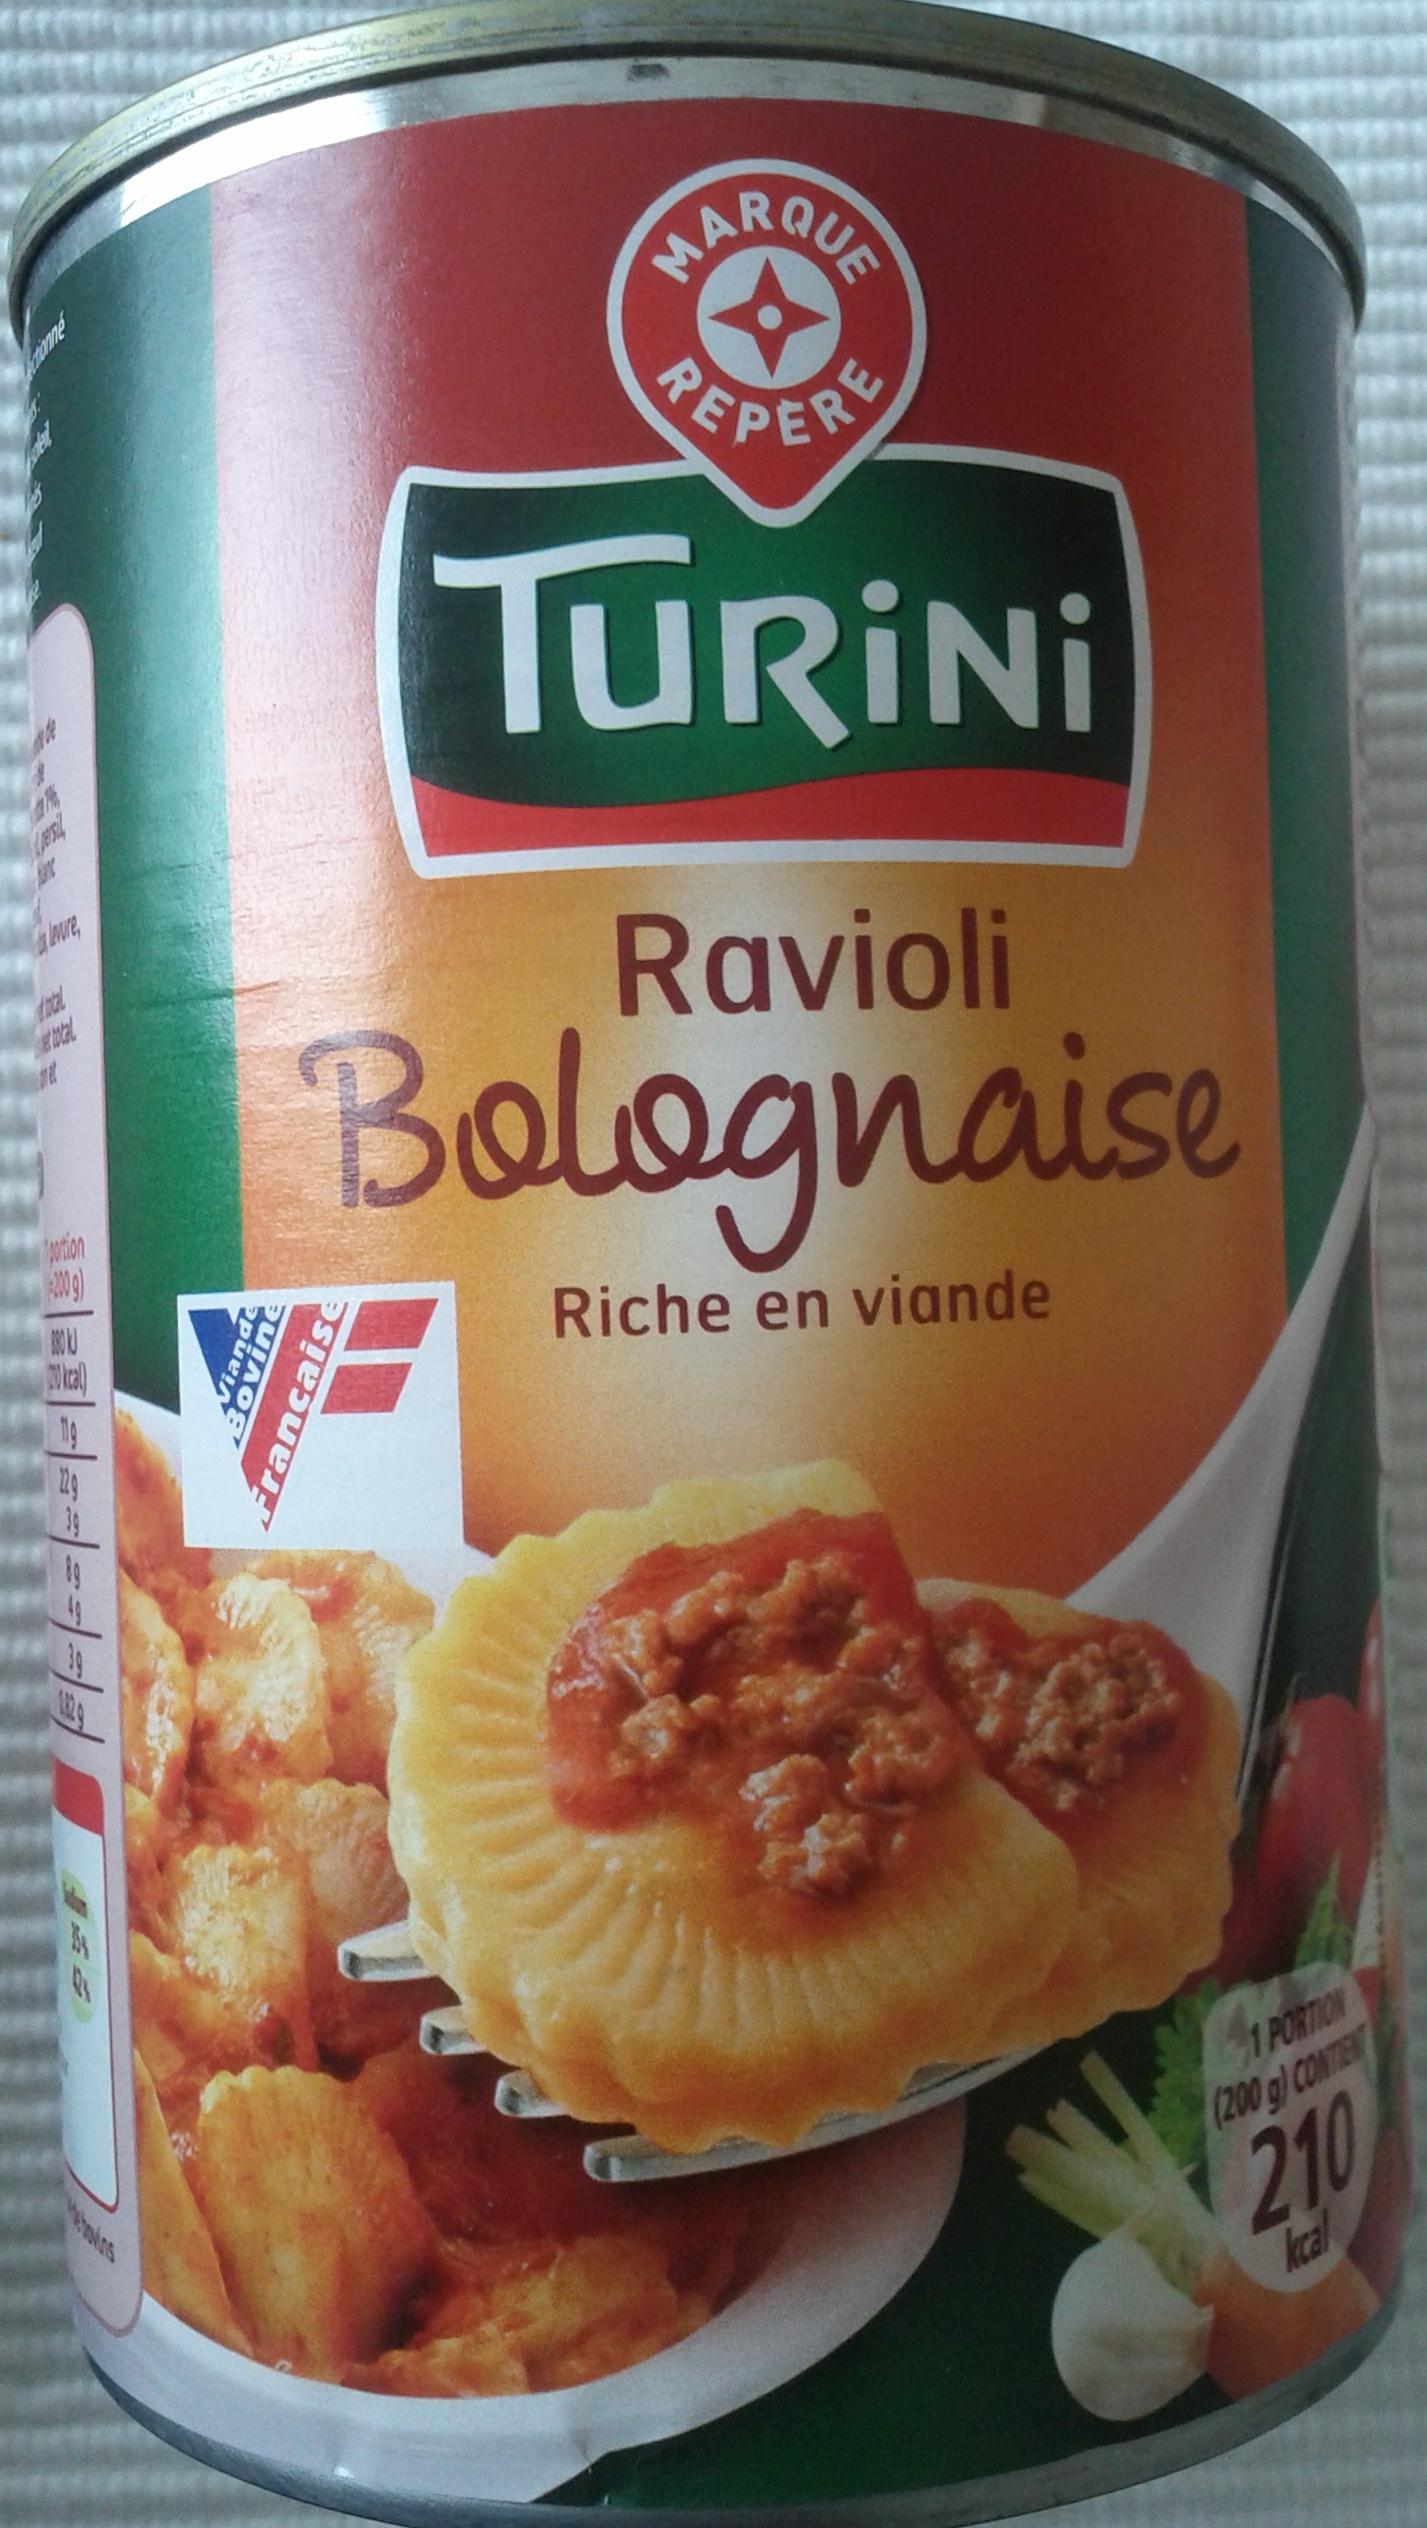 Ravioli Bolognaise (Riche en viande) - Product